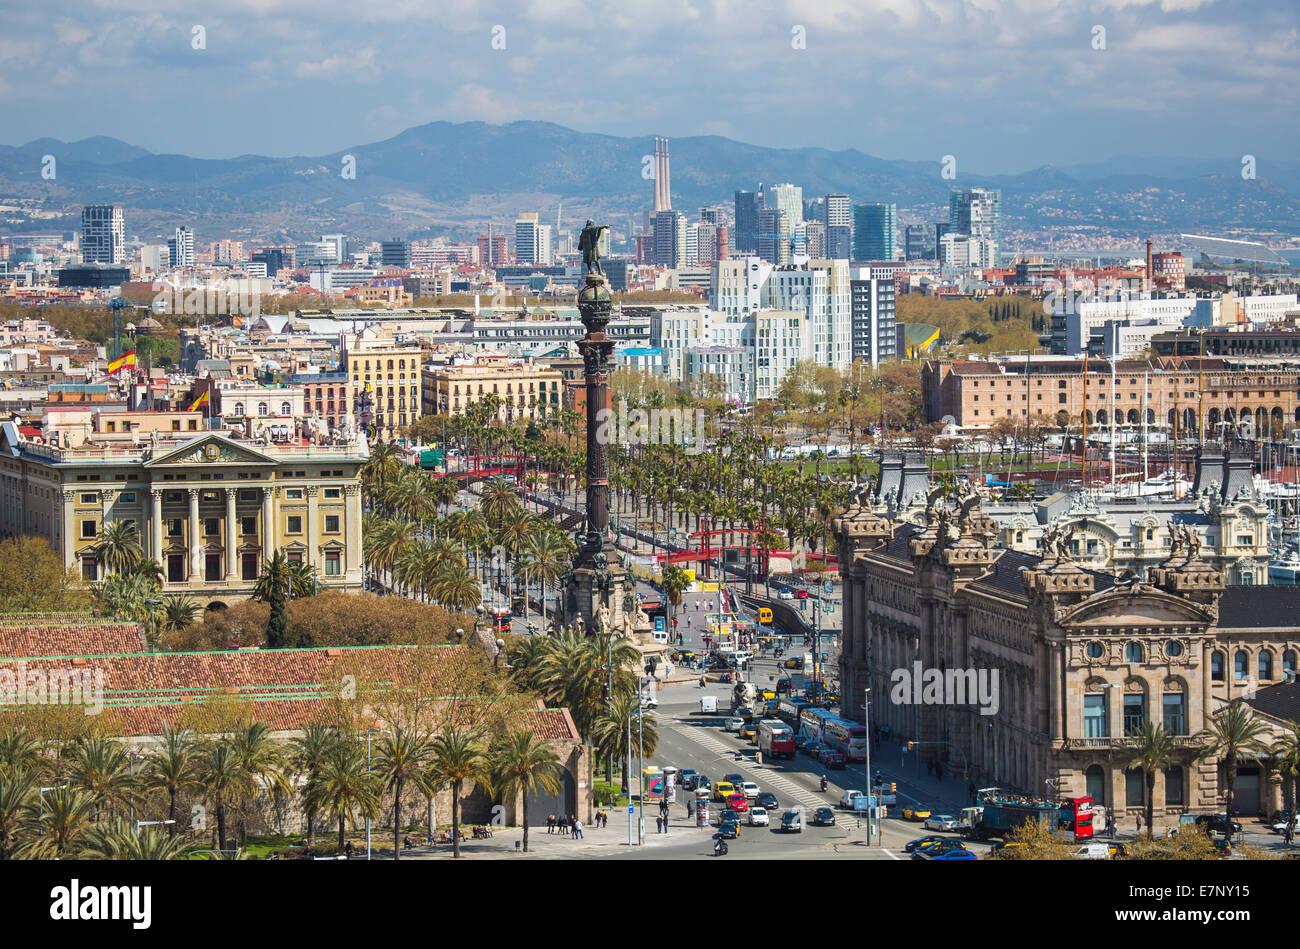 Barcelona, Catalonia, City, Ciutat Vella, Spain, Europe, architecture, atarazanas, Columbus, colon, diagonal mar, - Stock Image